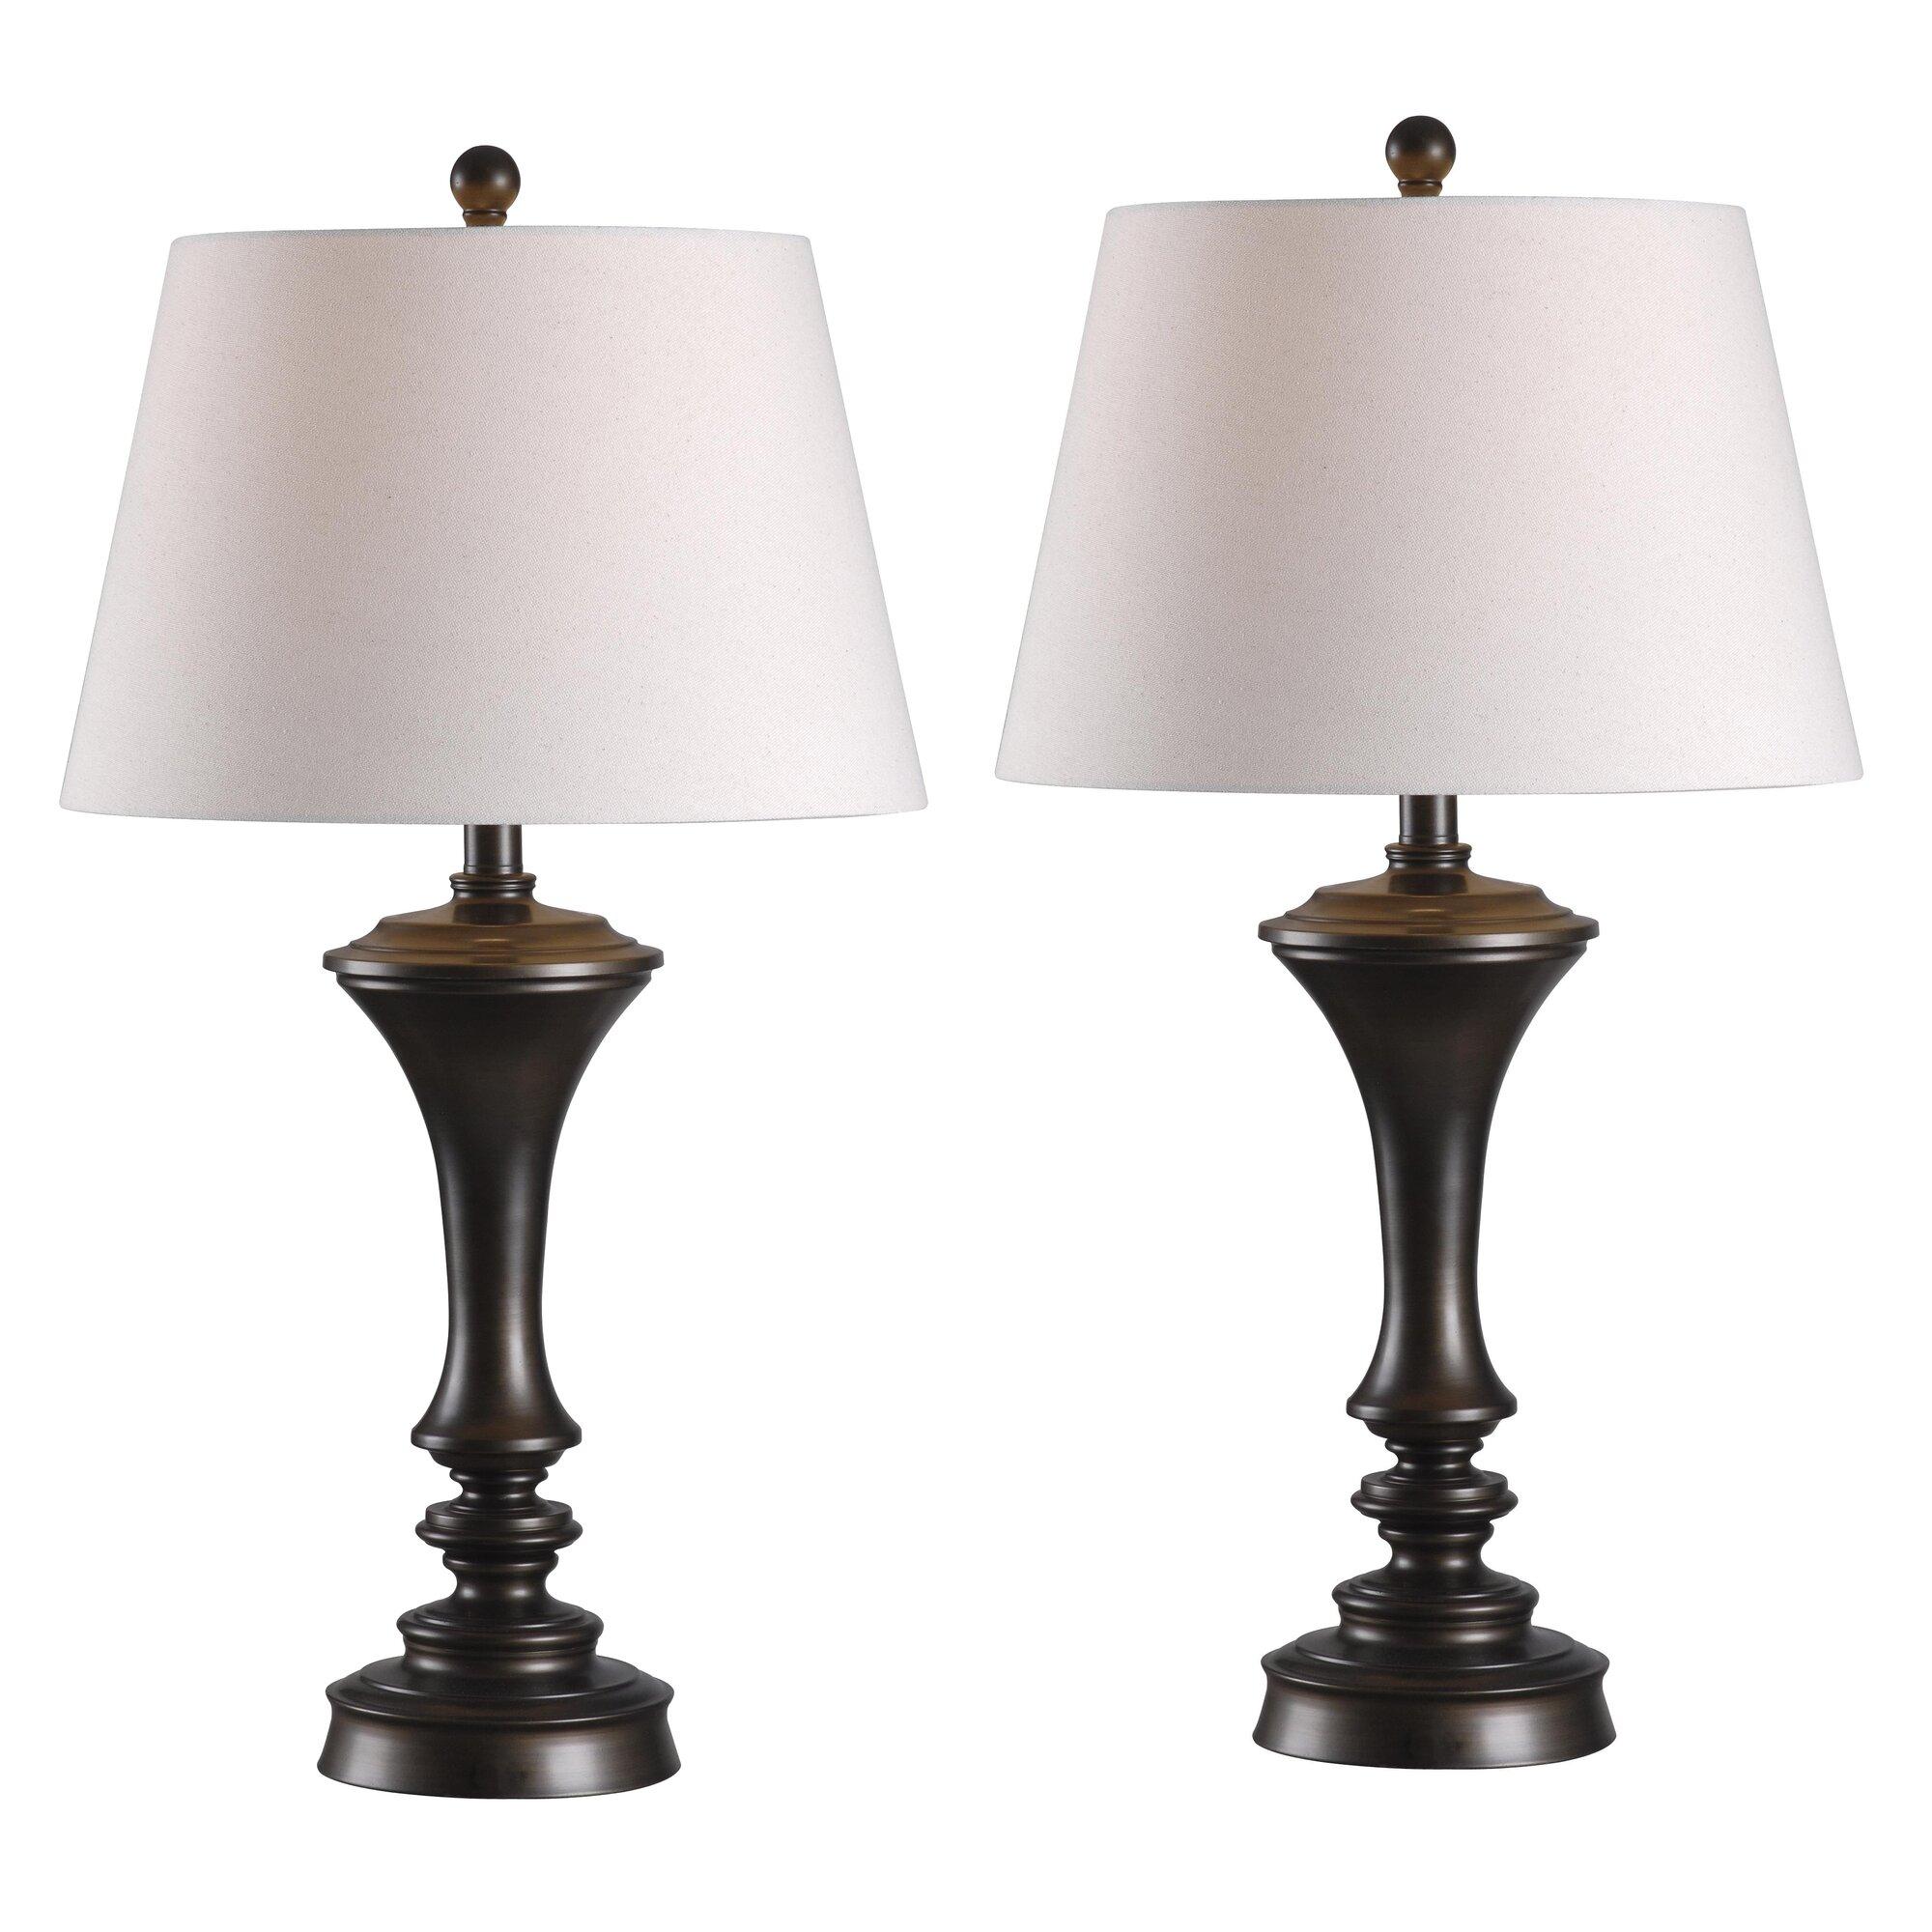 Andover Mills Norris 29quot Table Lamp Set amp Reviews Wayfairca : Norris2922TableLampSet from www.wayfair.ca size 2000 x 2000 jpeg 262kB